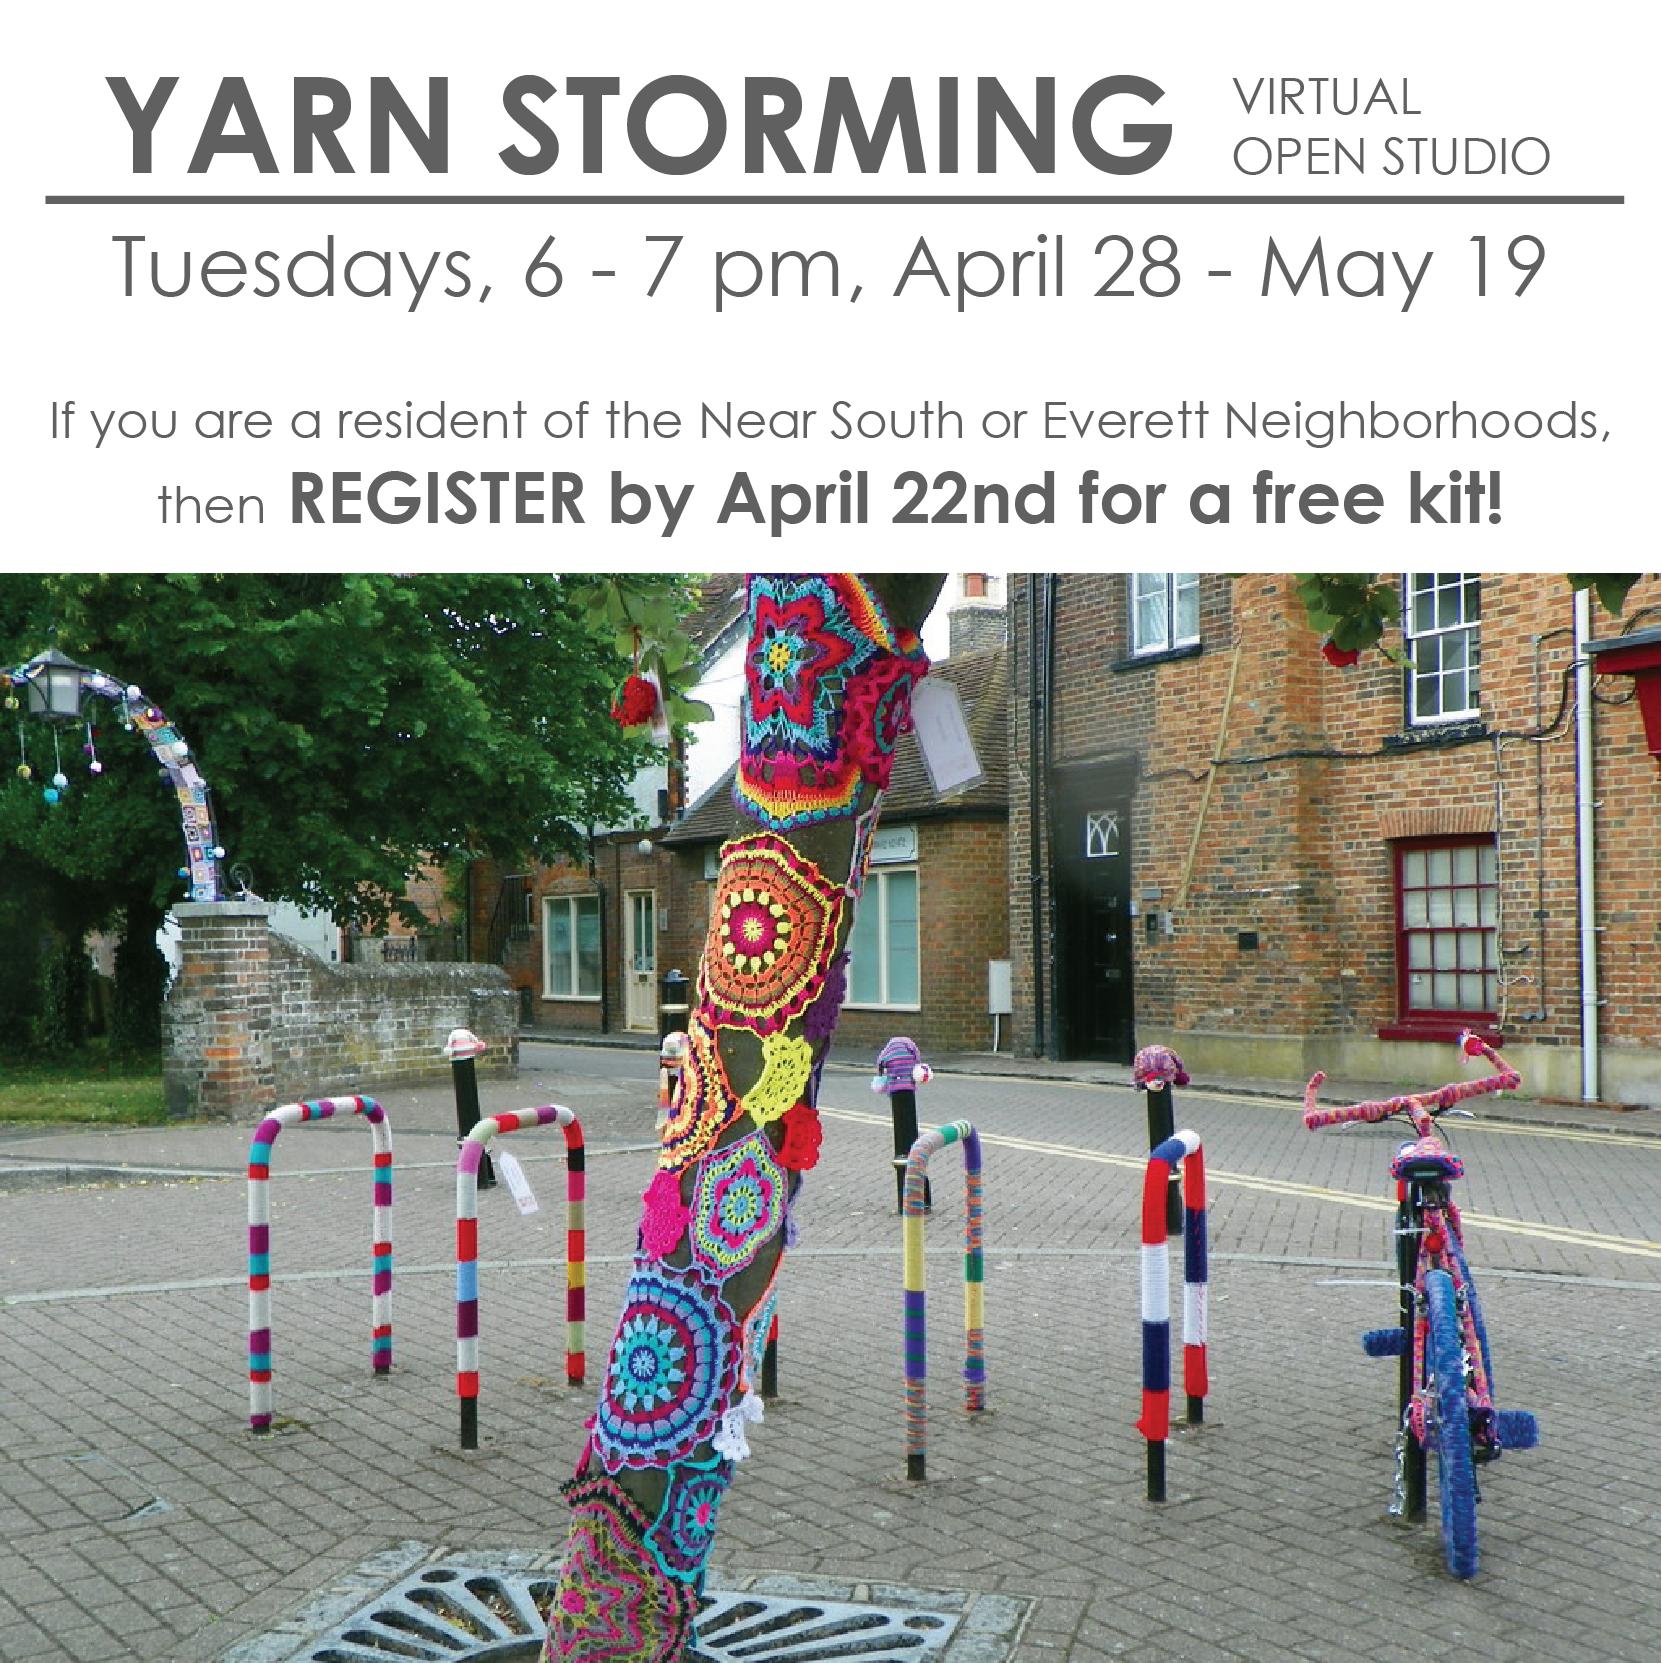 Yarn Storming